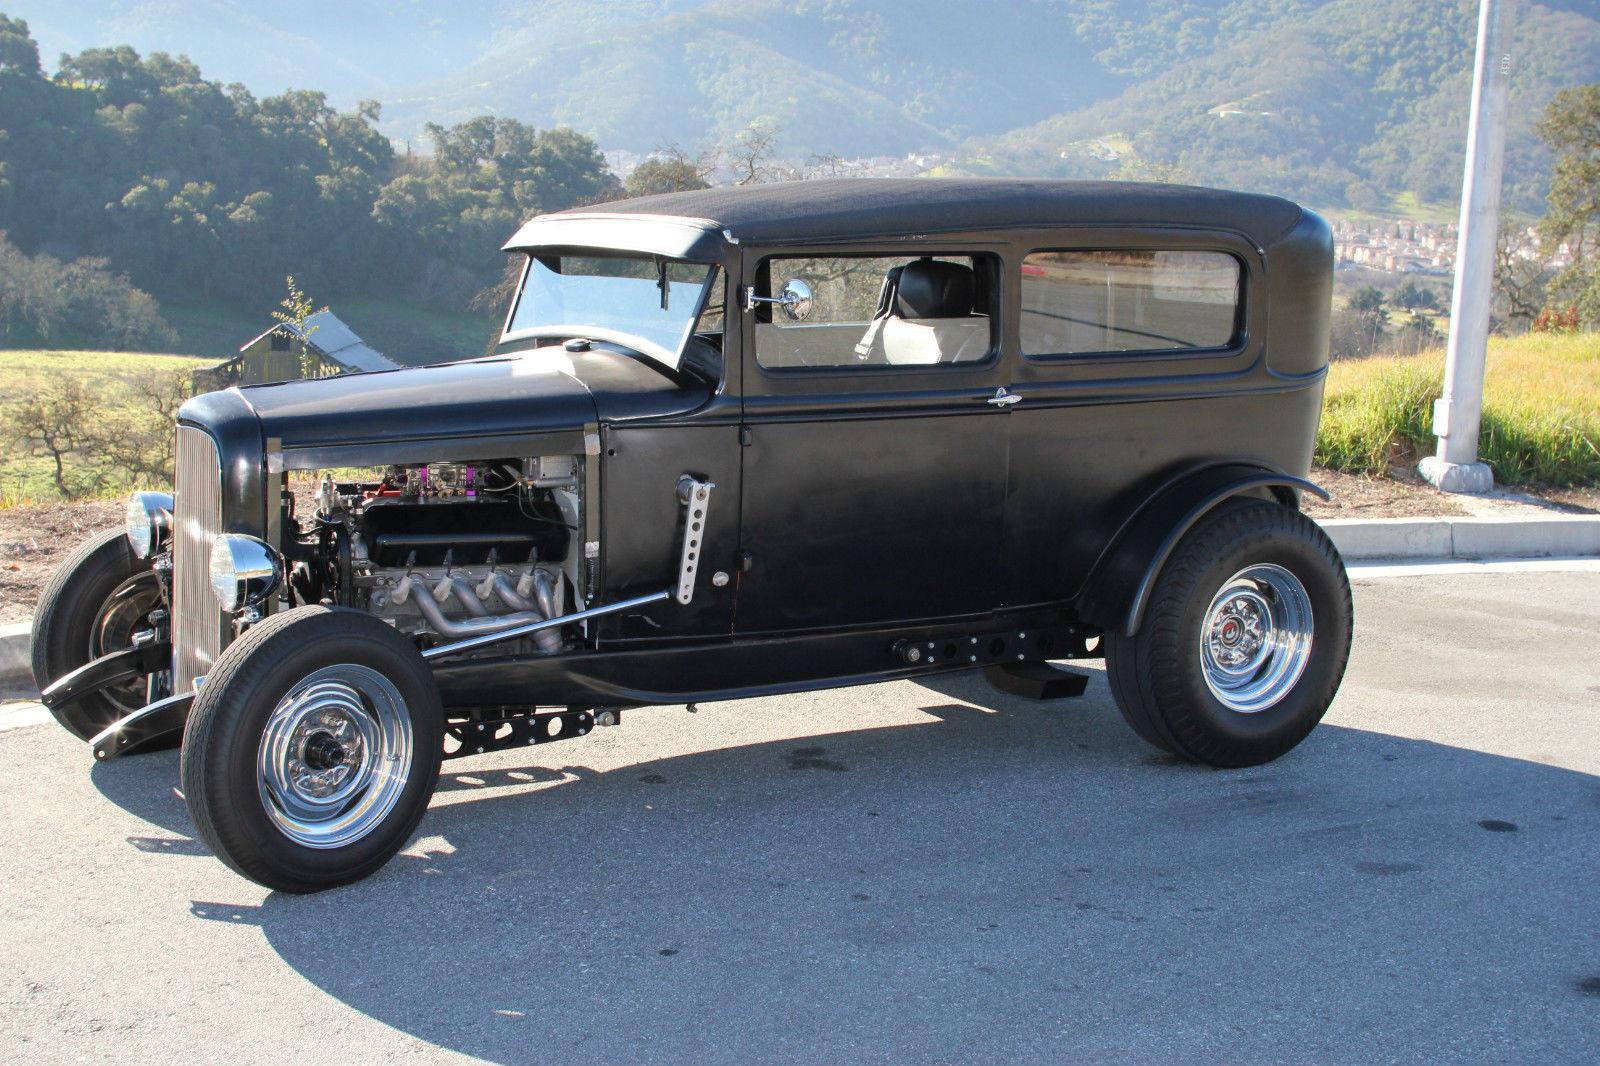 1931 ford model a tudor hot rod classic ford model a 1931 for sale. Black Bedroom Furniture Sets. Home Design Ideas